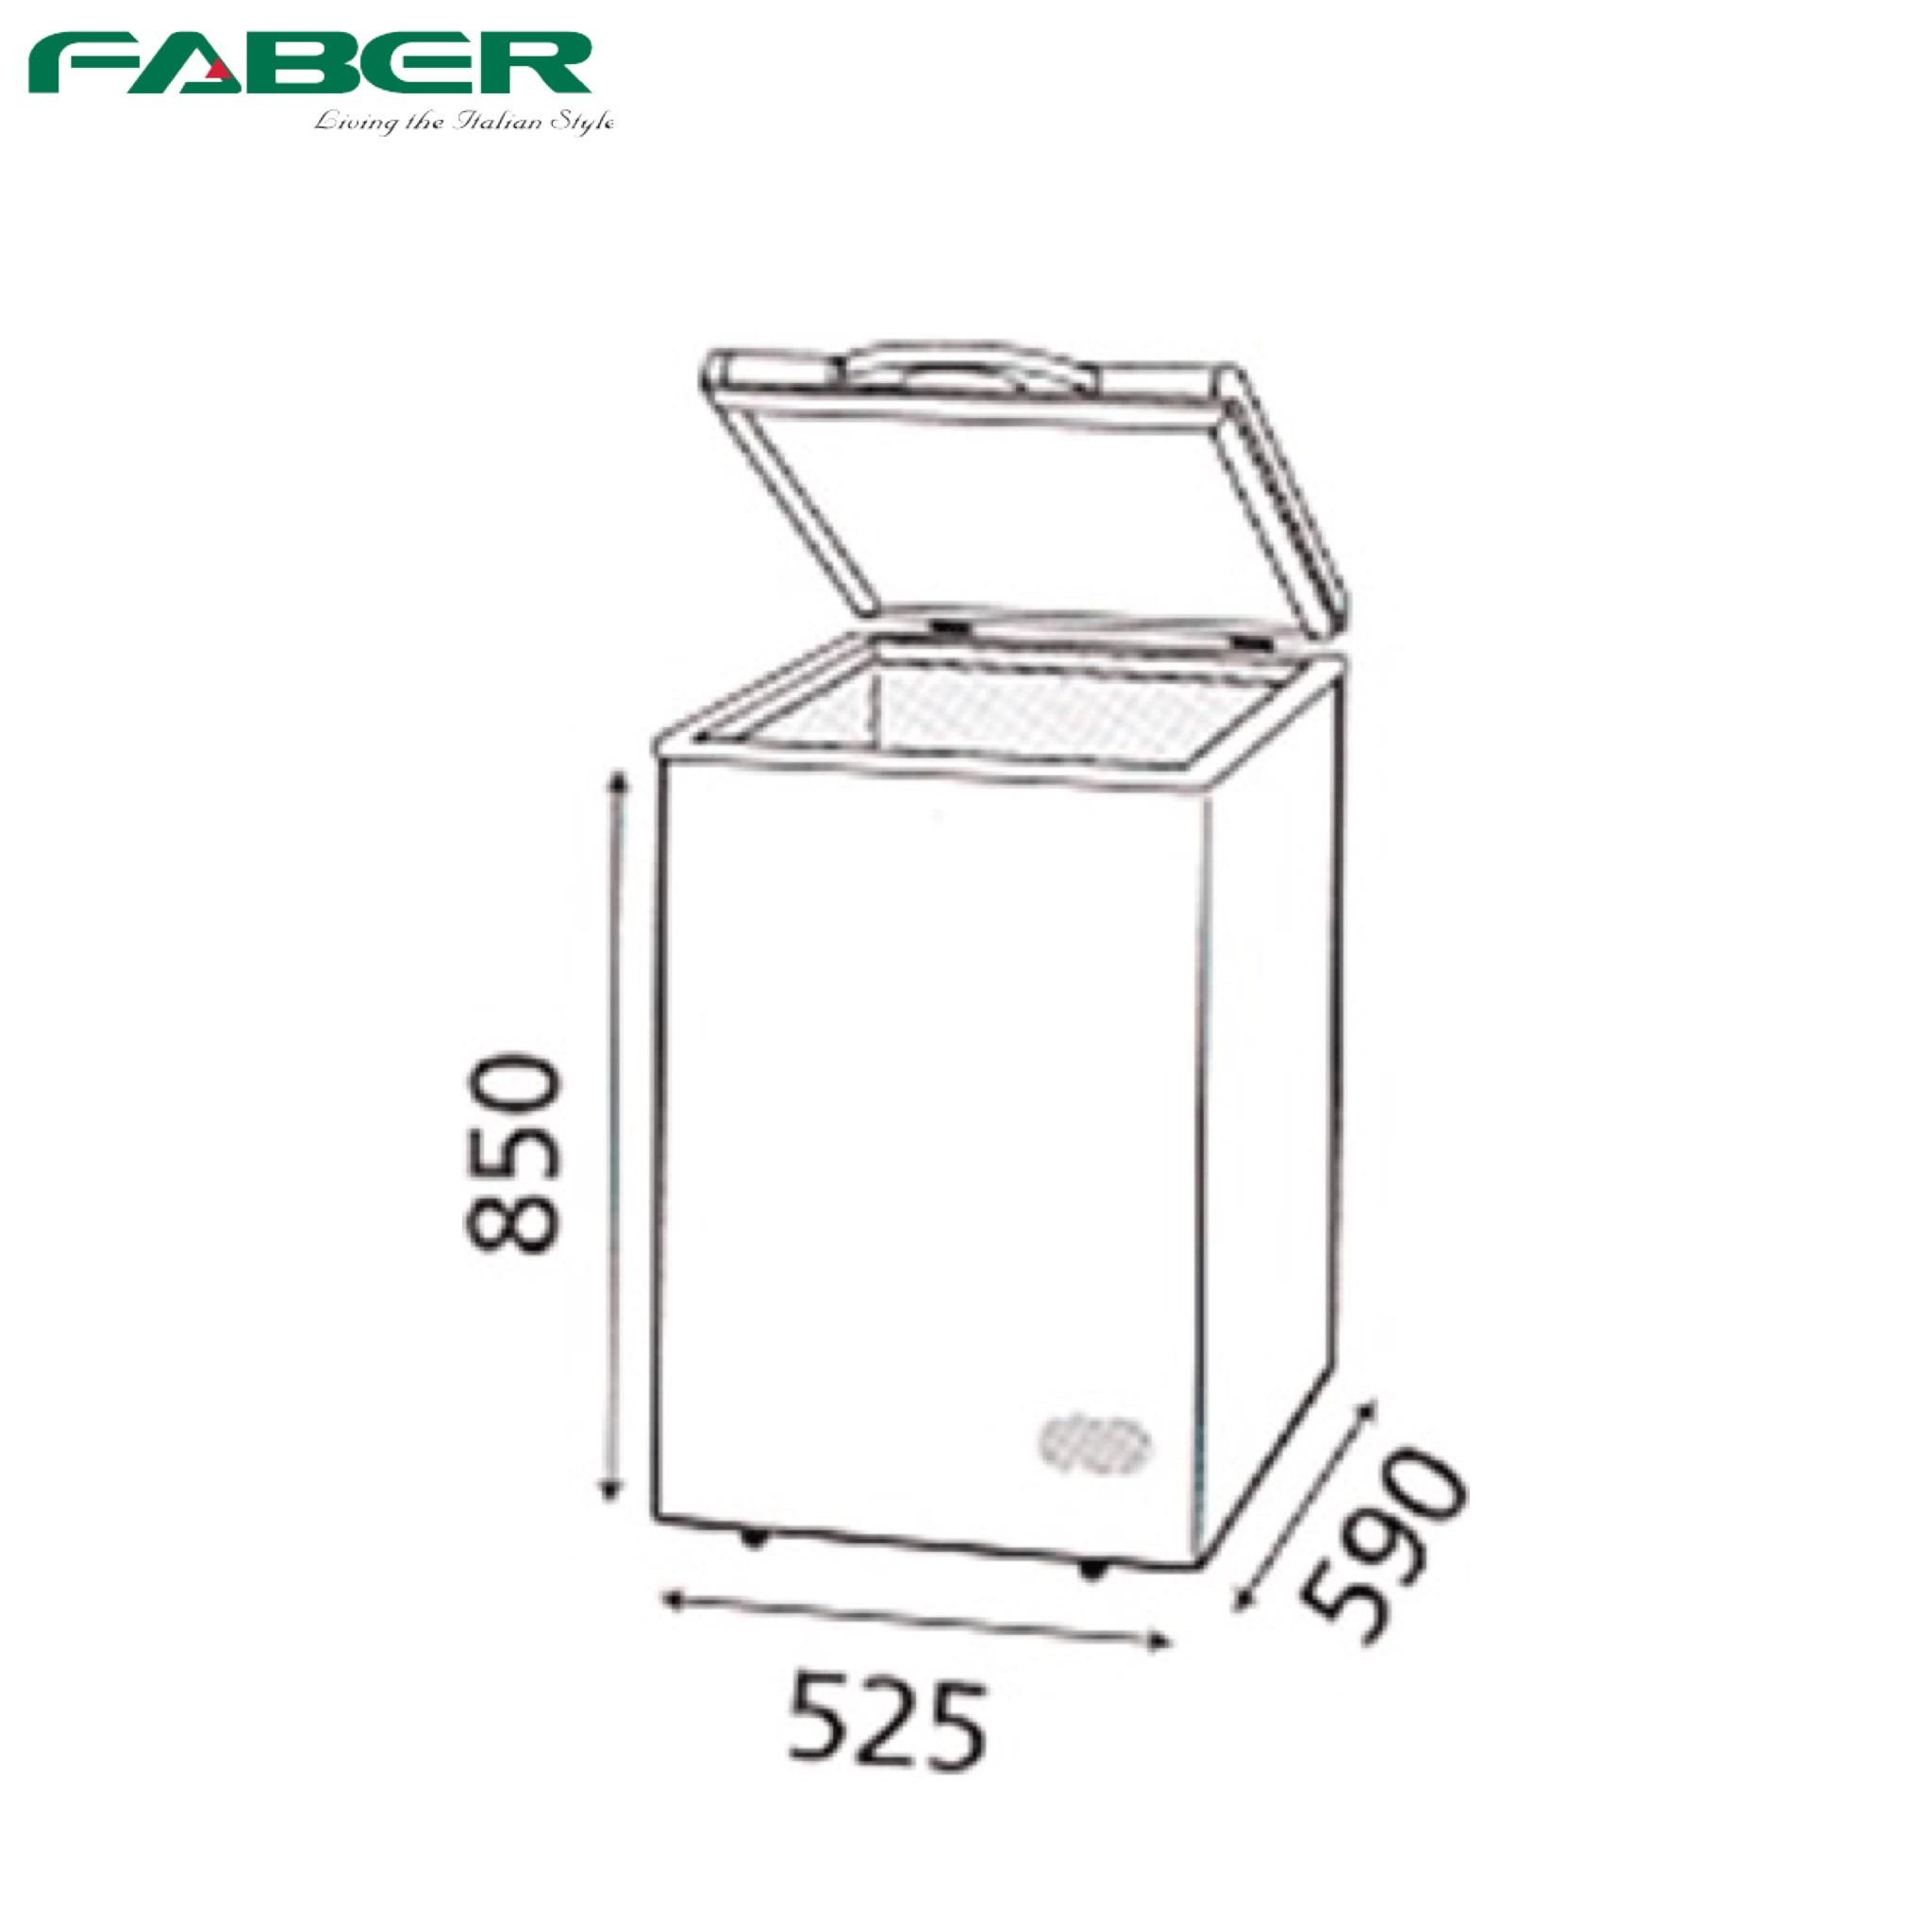 Faber FZF128N Chest Freezer 100L